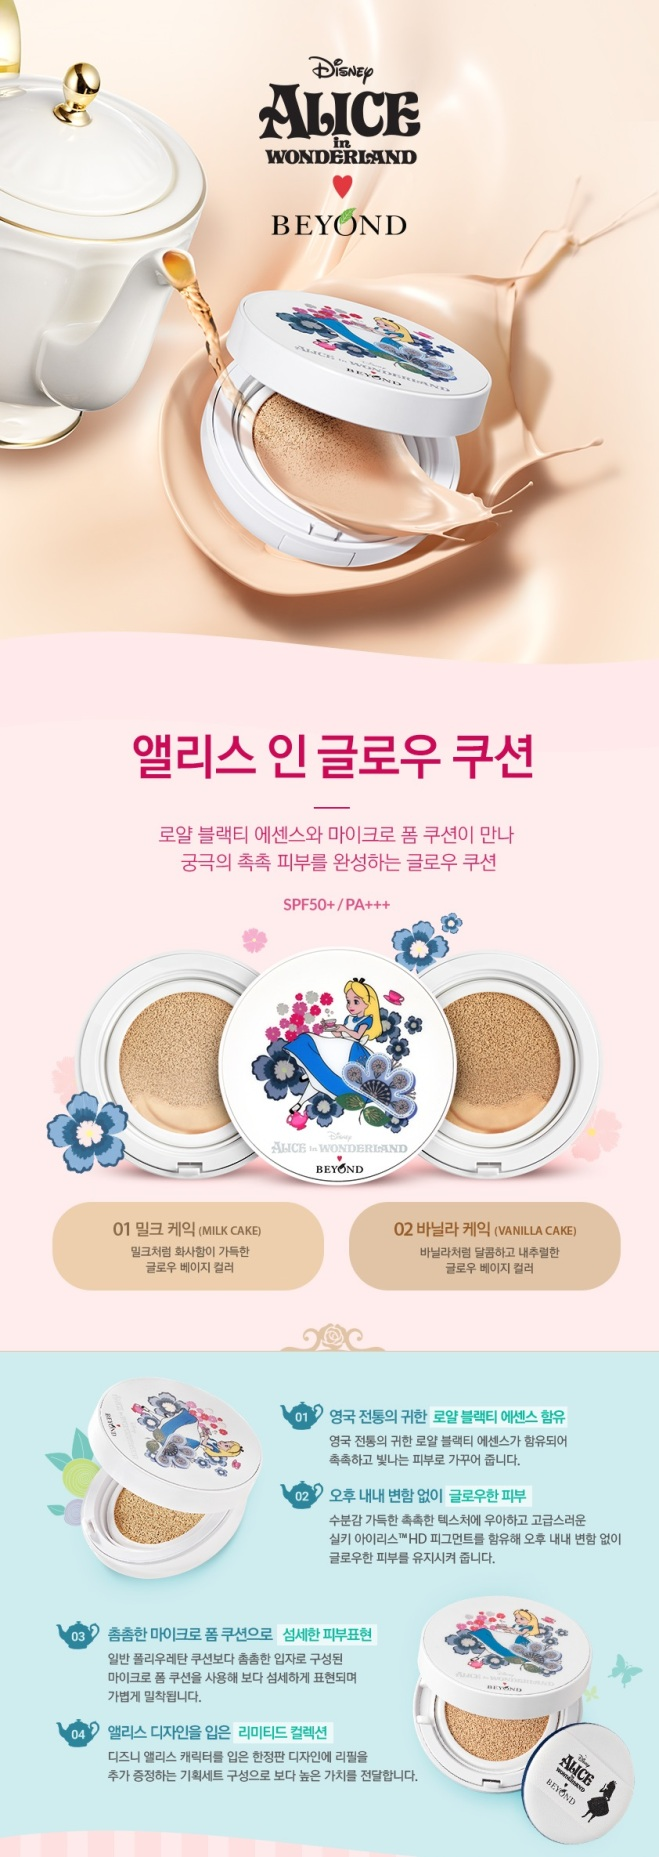 Credit: Beyond Korea website